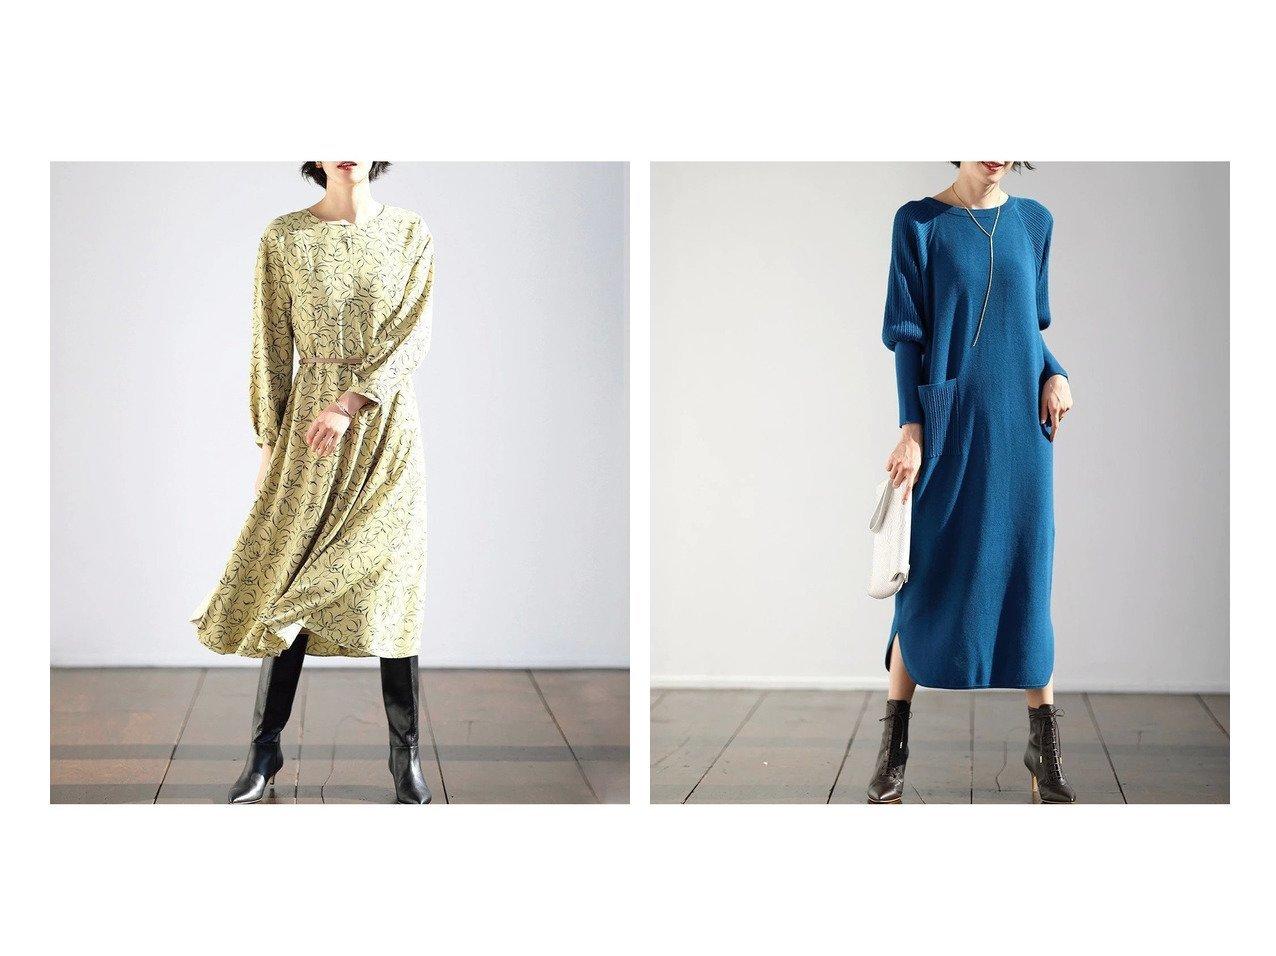 【DoCLASSE/ドゥクラッセ】のベネシャン・プリントワンピース&コットン混ニット・バルーン袖ワンピ/マキシ ドゥクラッセの40代、50代の方におすすめ!人気トレンド・ファッションの通販 おすすめで人気の流行・トレンド、ファッションの通販商品 メンズファッション・キッズファッション・インテリア・家具・レディースファッション・服の通販 founy(ファニー) https://founy.com/ ファッション Fashion レディースファッション WOMEN ワンピース Dress とろみ プリント モダン 春 Spring おすすめ Recommend スタイリッシュ ストレート チャーム バルーン ポケット マキシ ミックス |ID:crp329100000021630